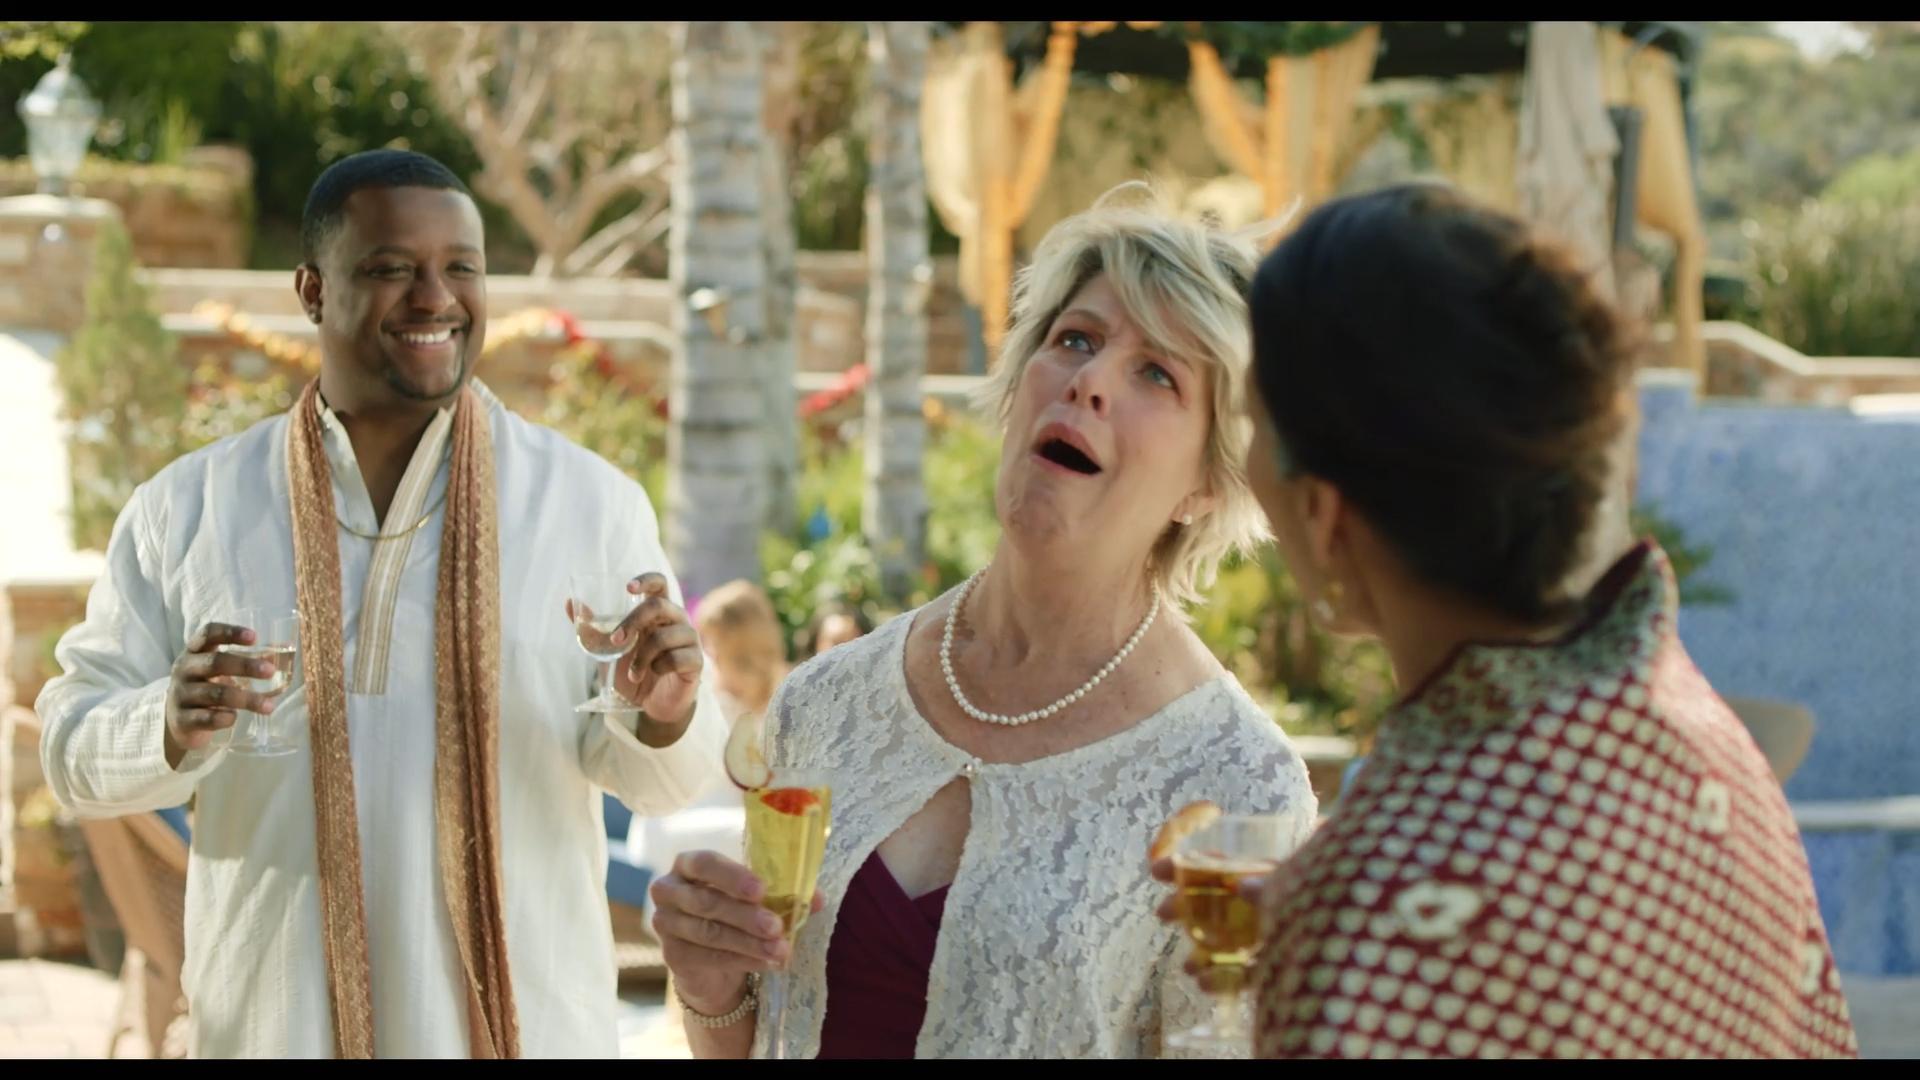 Roberta Hanlen and Matt Richards in The Last Conception (2020)